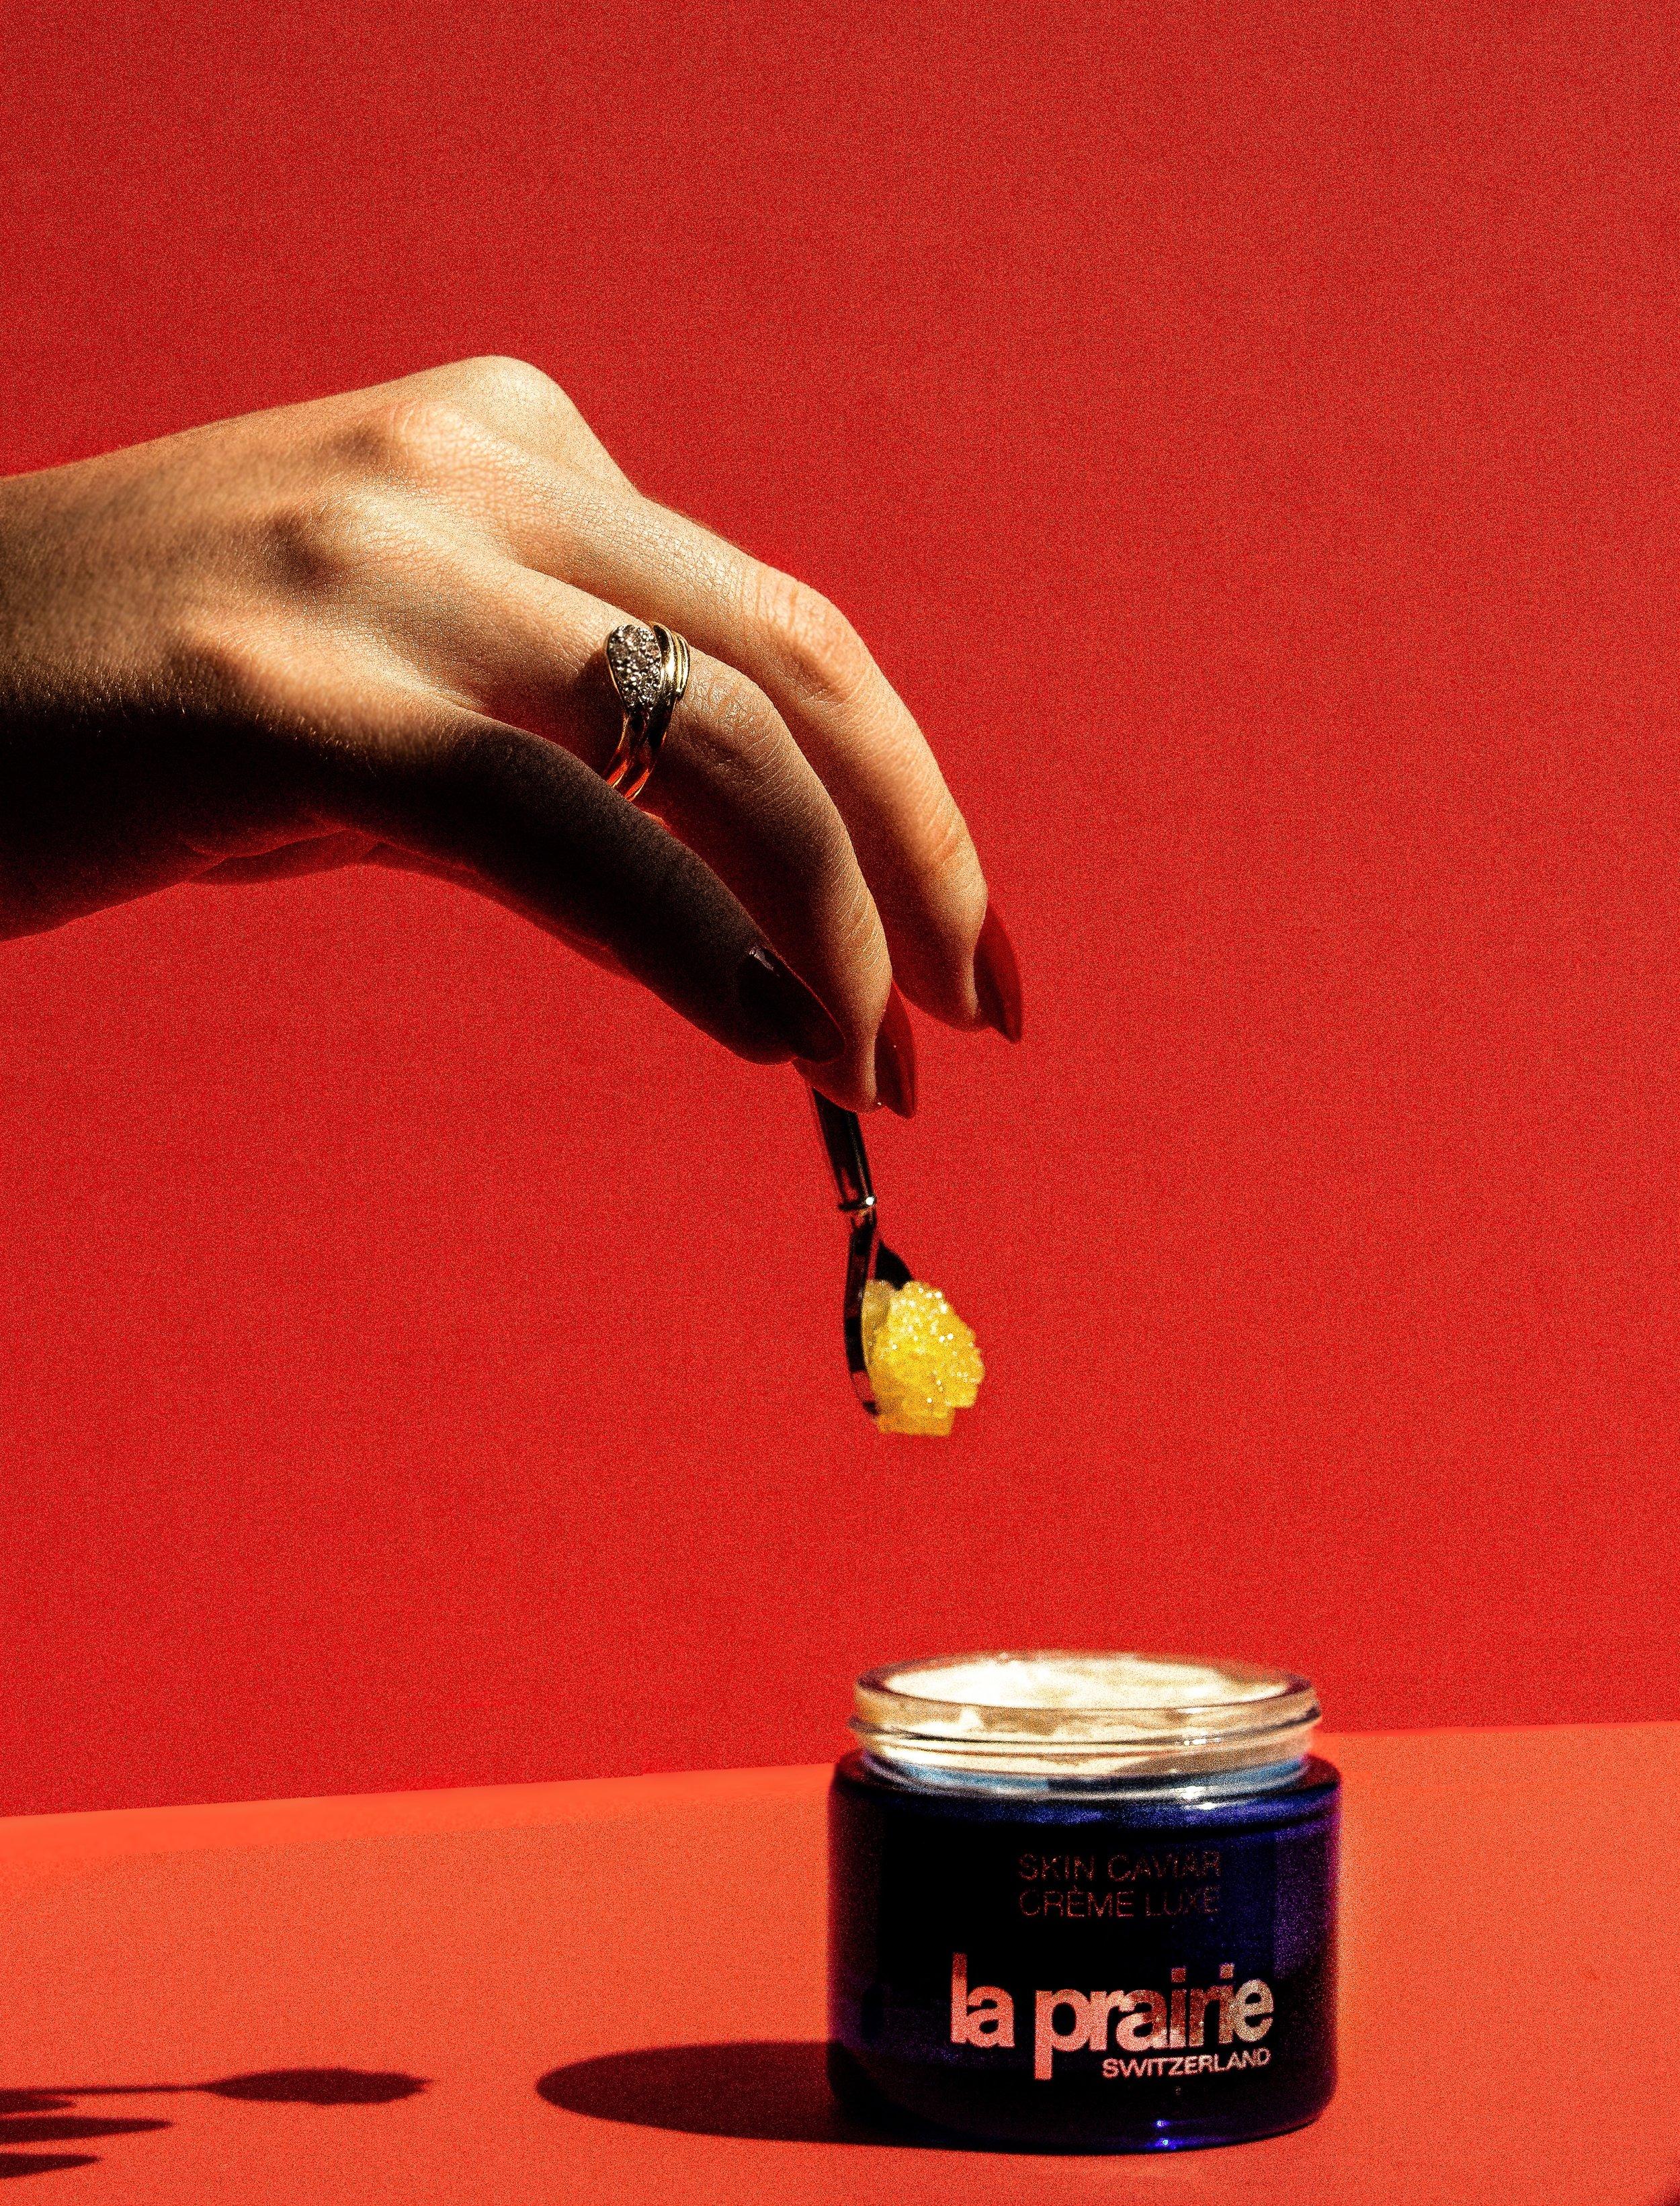 Jenny-Tarbell-Image-La_Prairie_Skin_Luxe_Caviar_Cream_JVB.jpeg